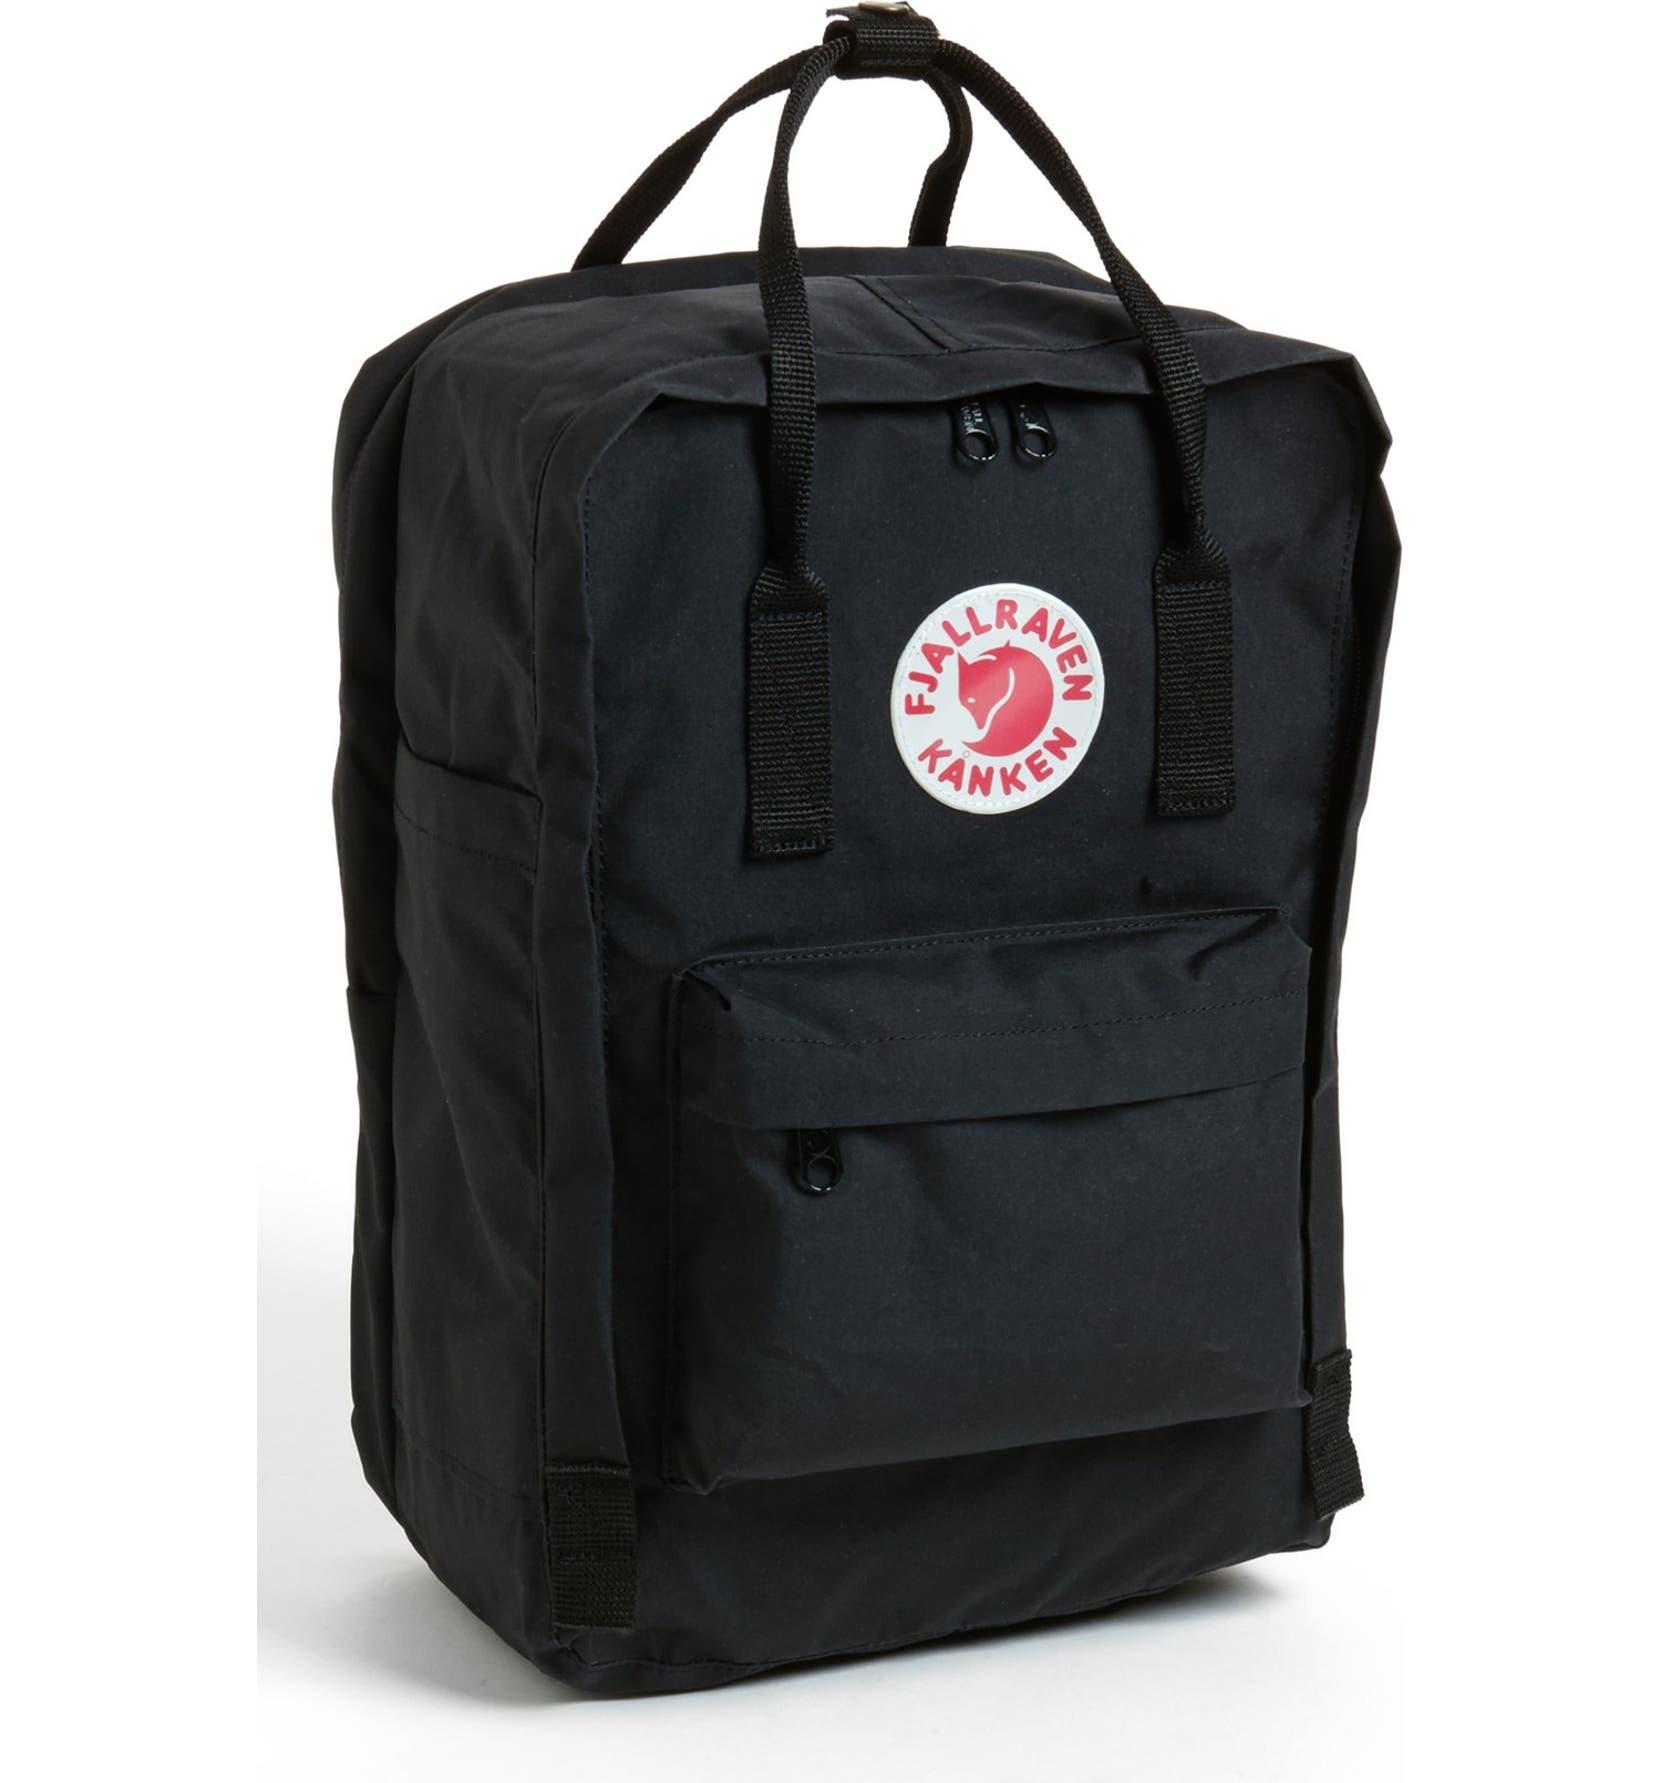 90026f2273a1 Fjällräven  Kånken  Laptop Backpack (15 Inch)